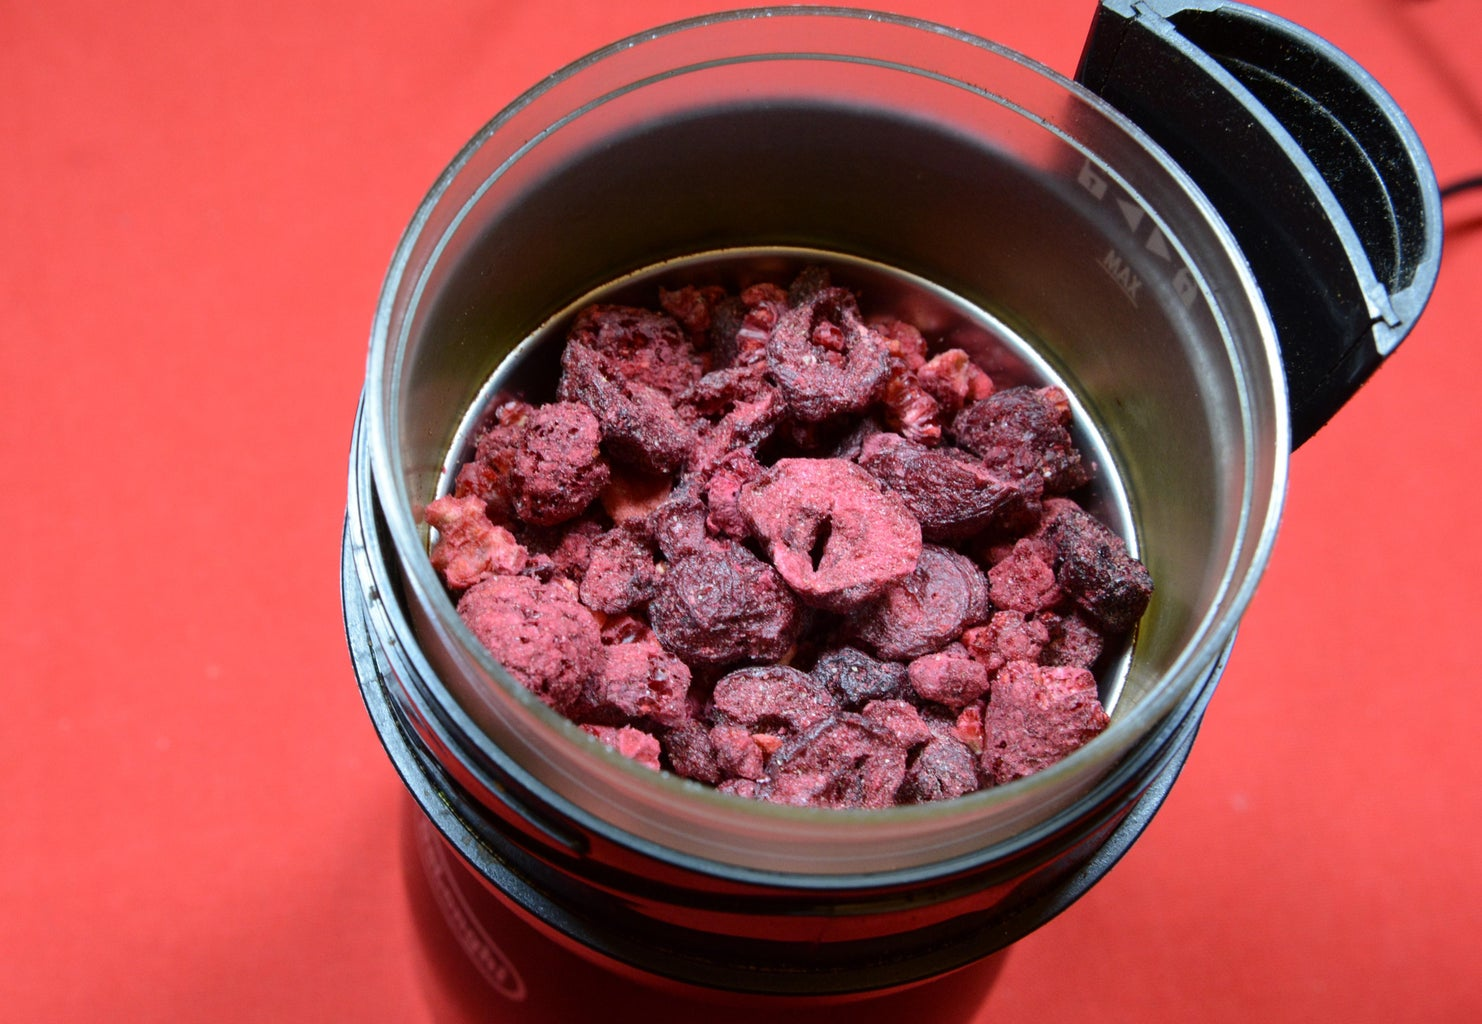 Powder Raspberries